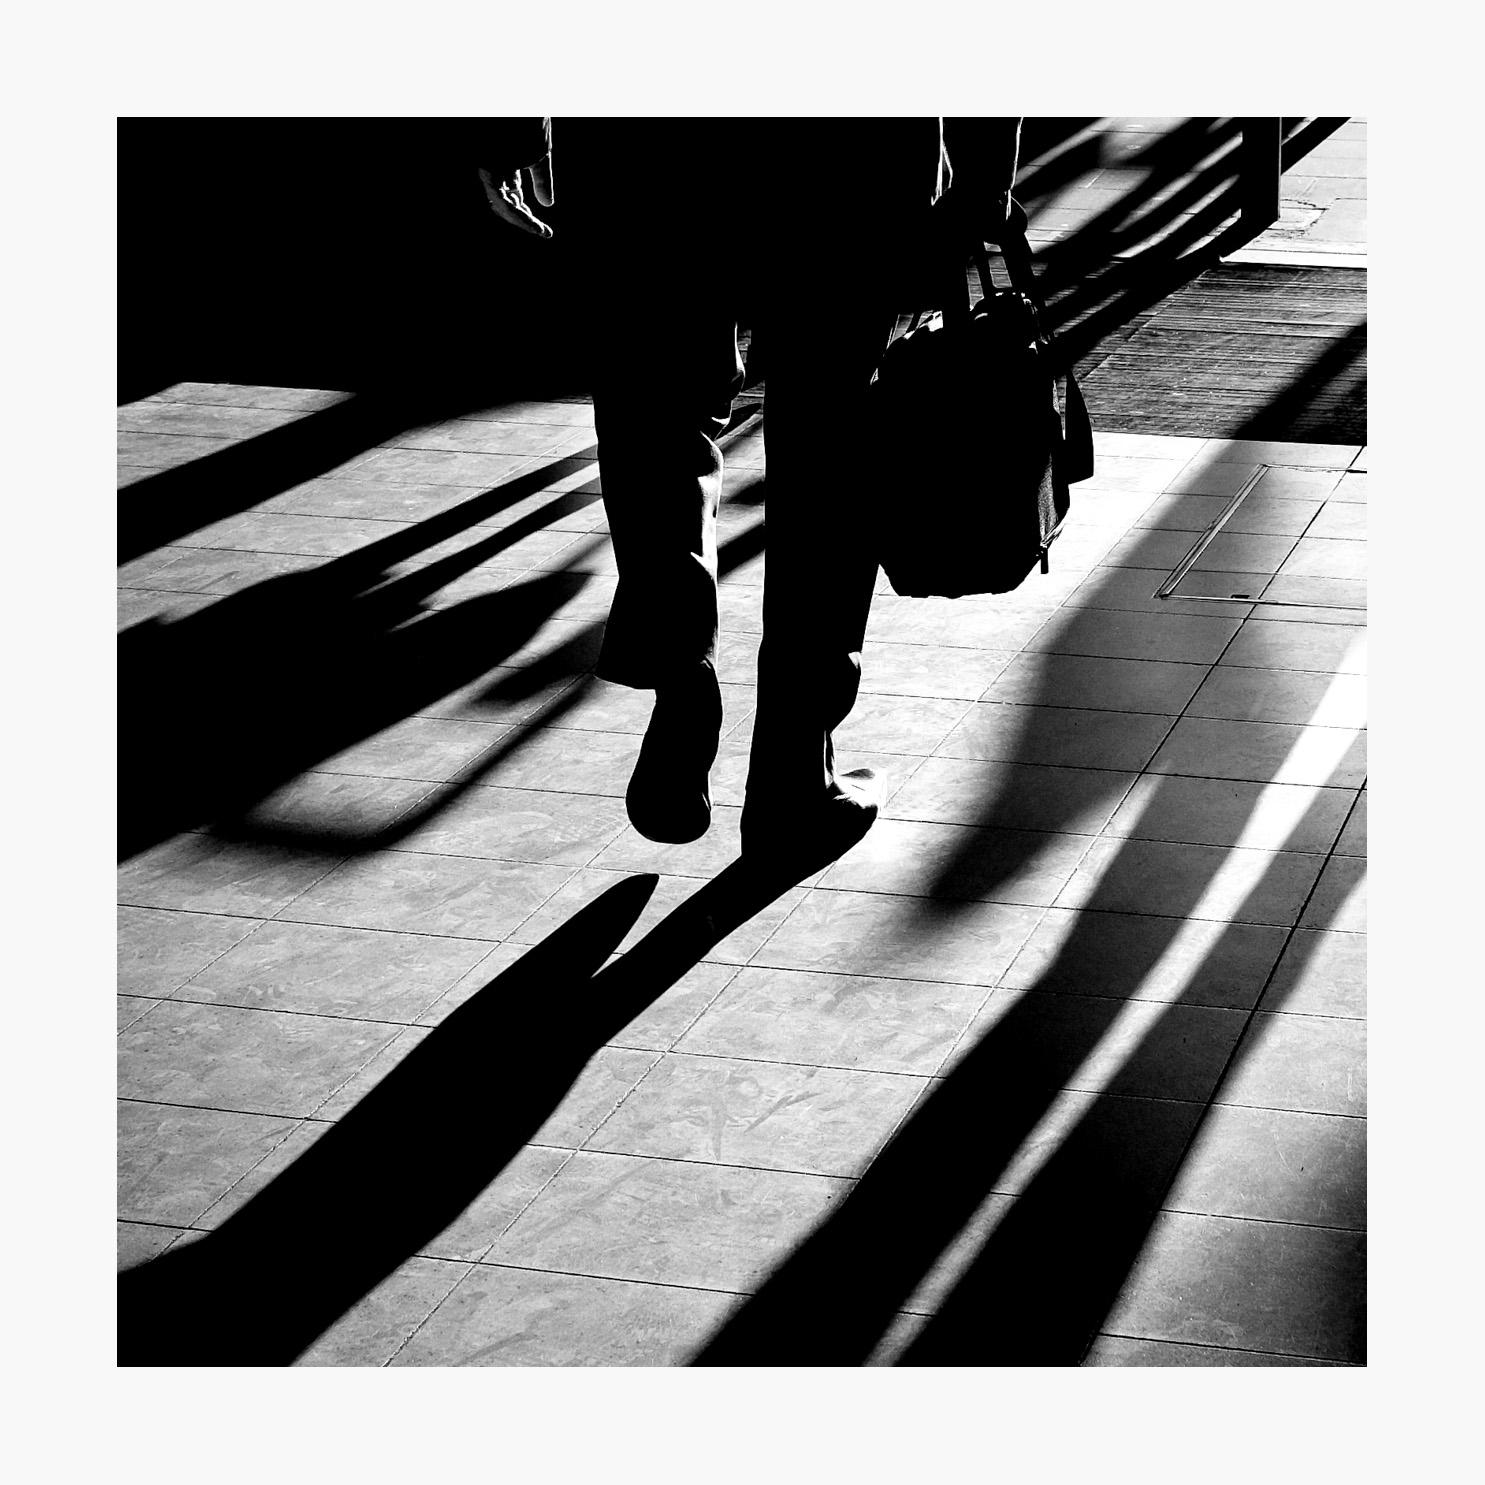 ©-Harry-W-Edmonds-2018-@photographersnote-Street-Sights-Social-PN02.jpg